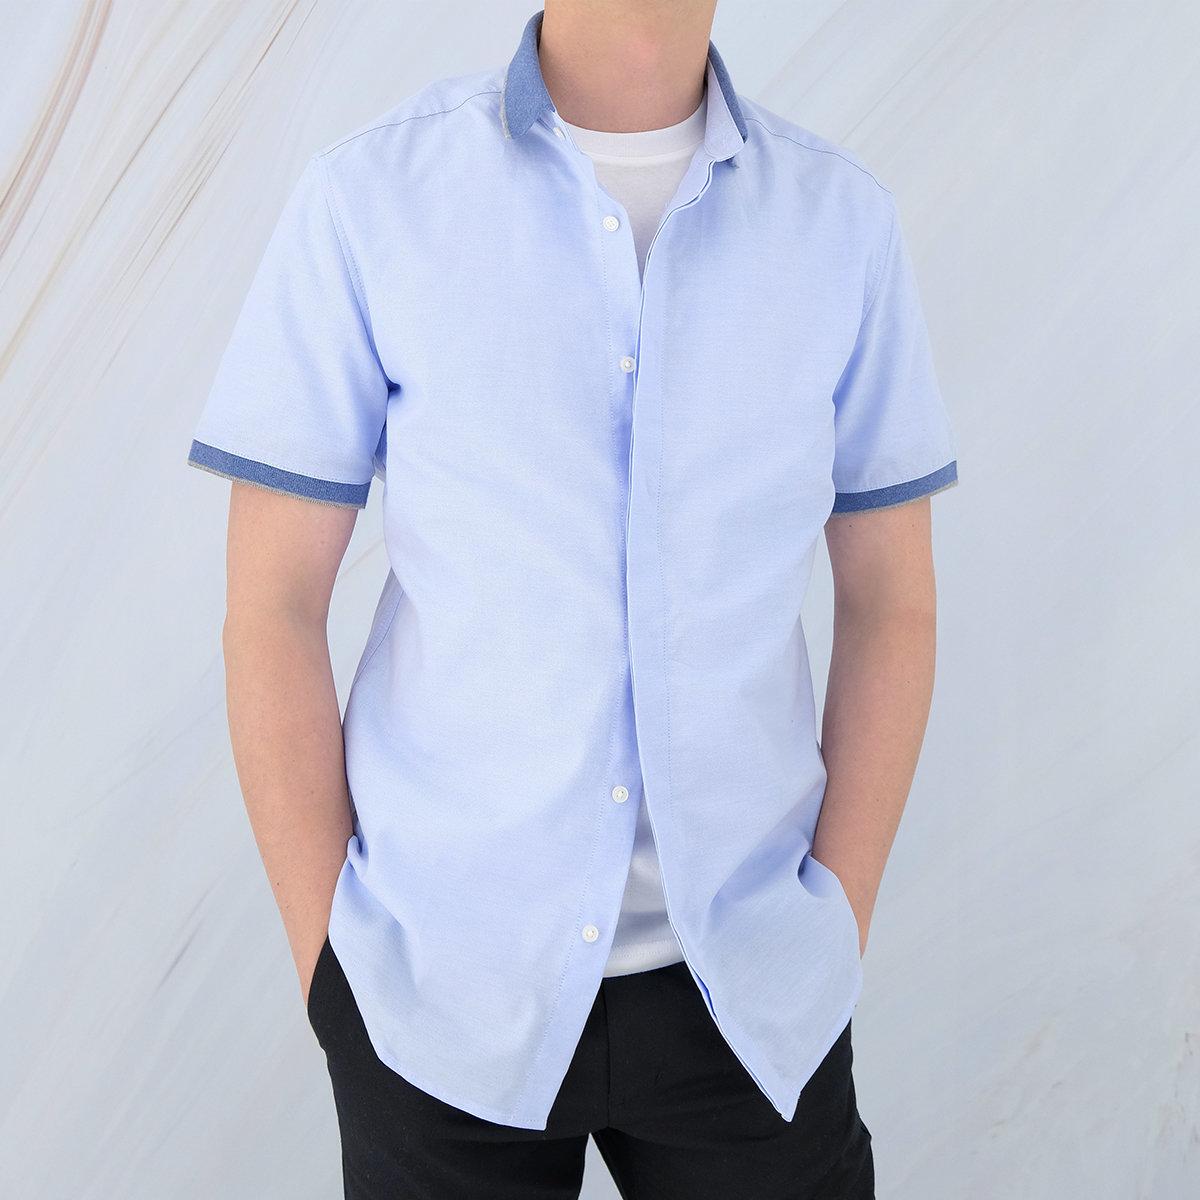 Men's Cotton 2-tone Oxford Short Sleeve Causal Shirt (Aqua)